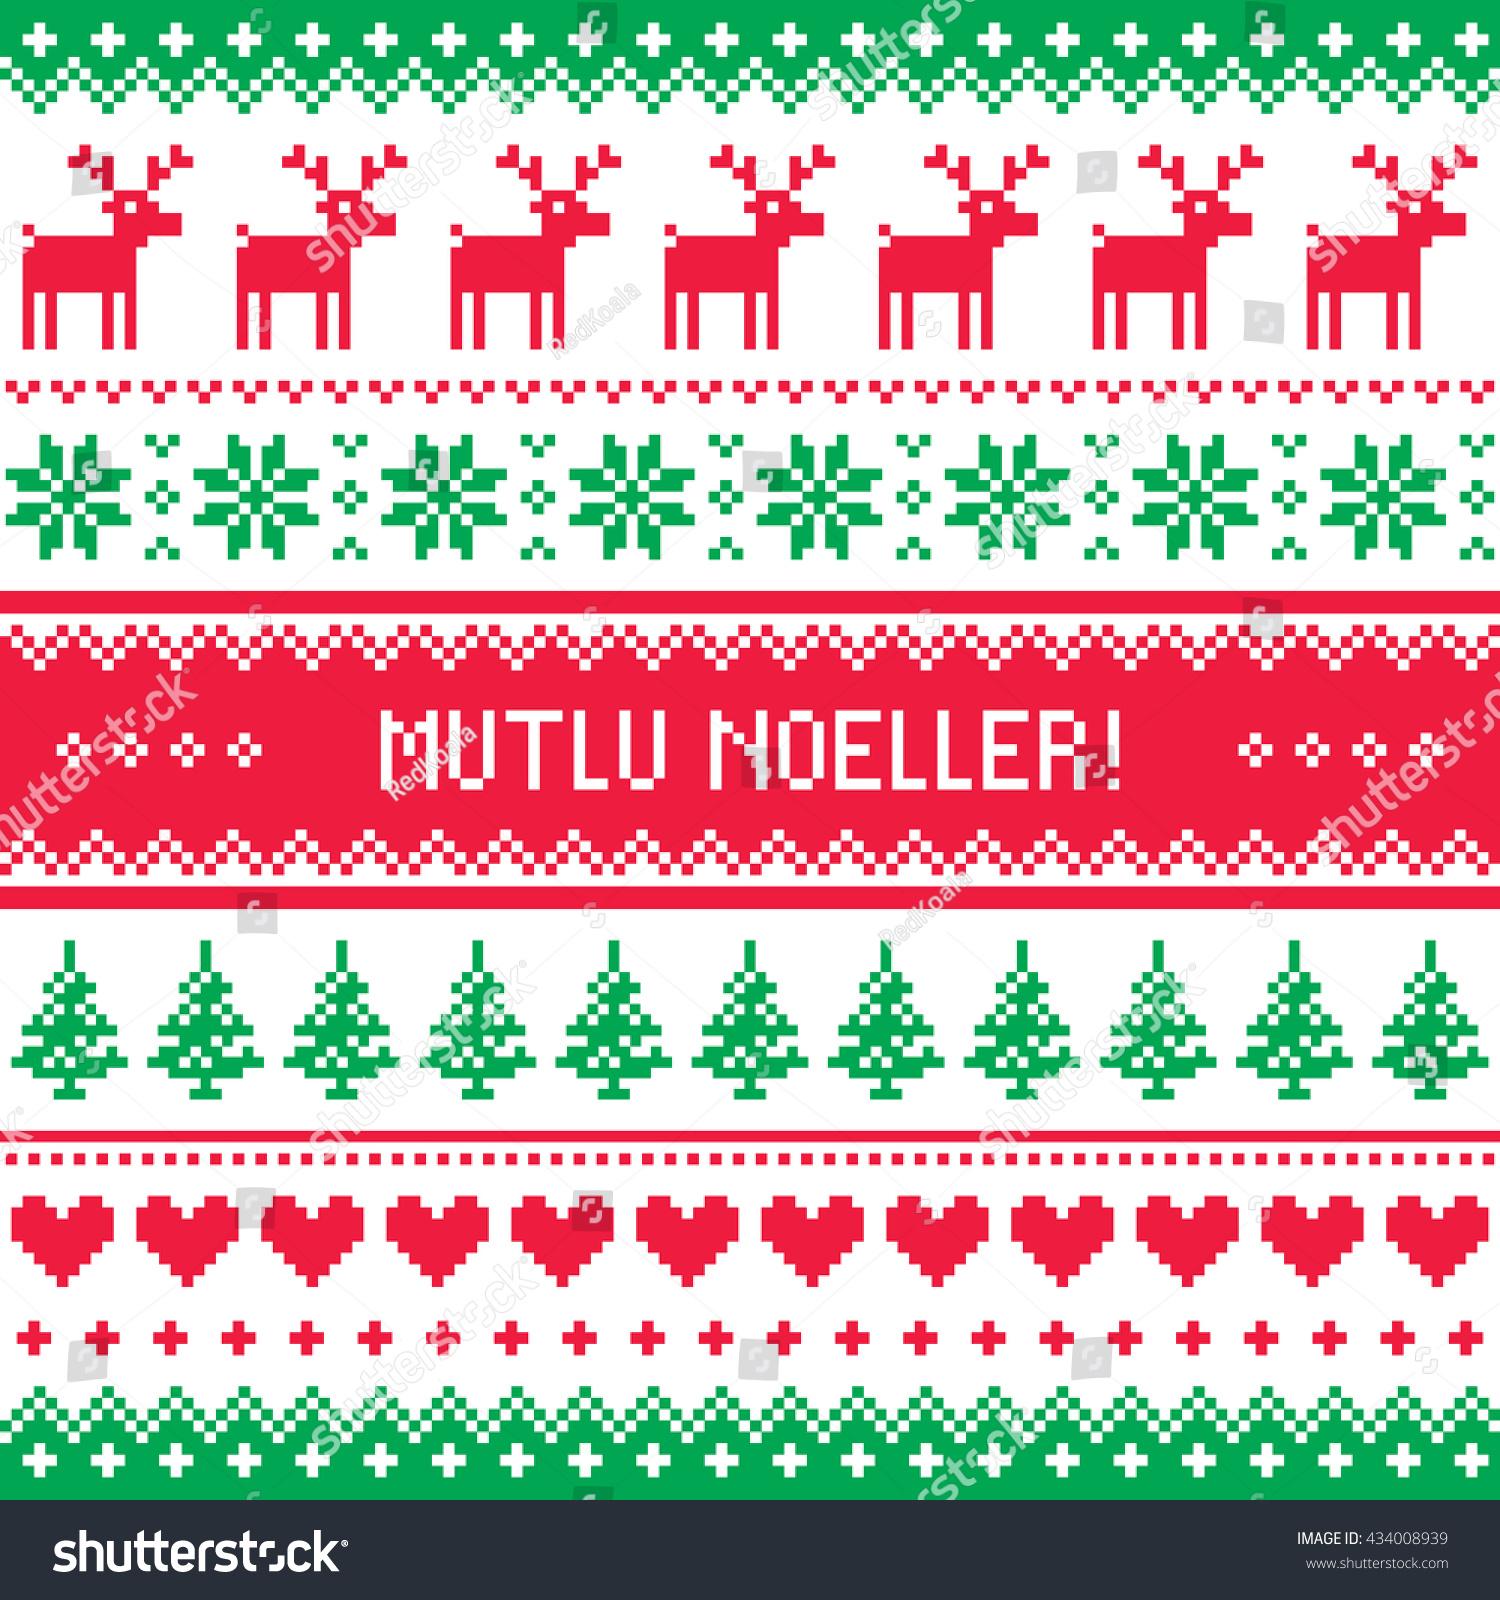 Merry Christmas Turkish Mutlu Noeller Pattern Stock Vector ...